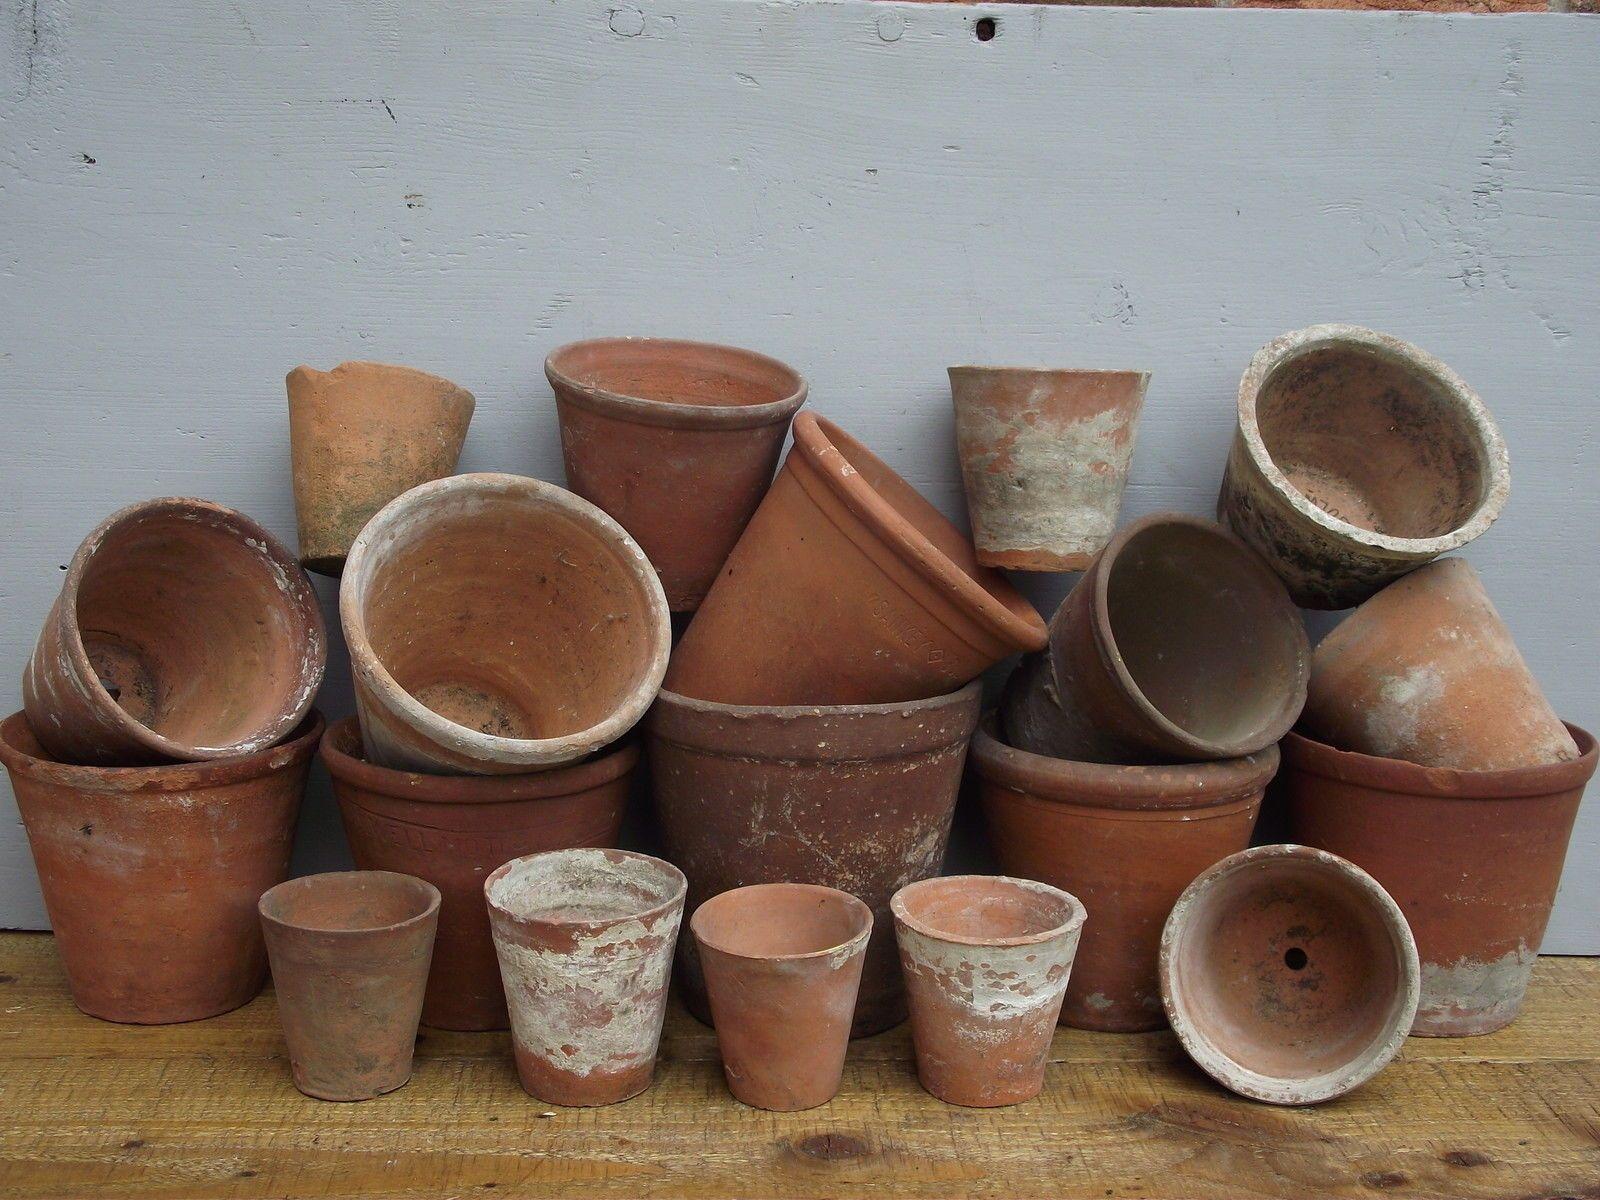 Vintage English Terra Cotta Pots In Antiques Architectural Antiques Garden Terracotta Plant Pots Garden Troughs Terracotta Pots